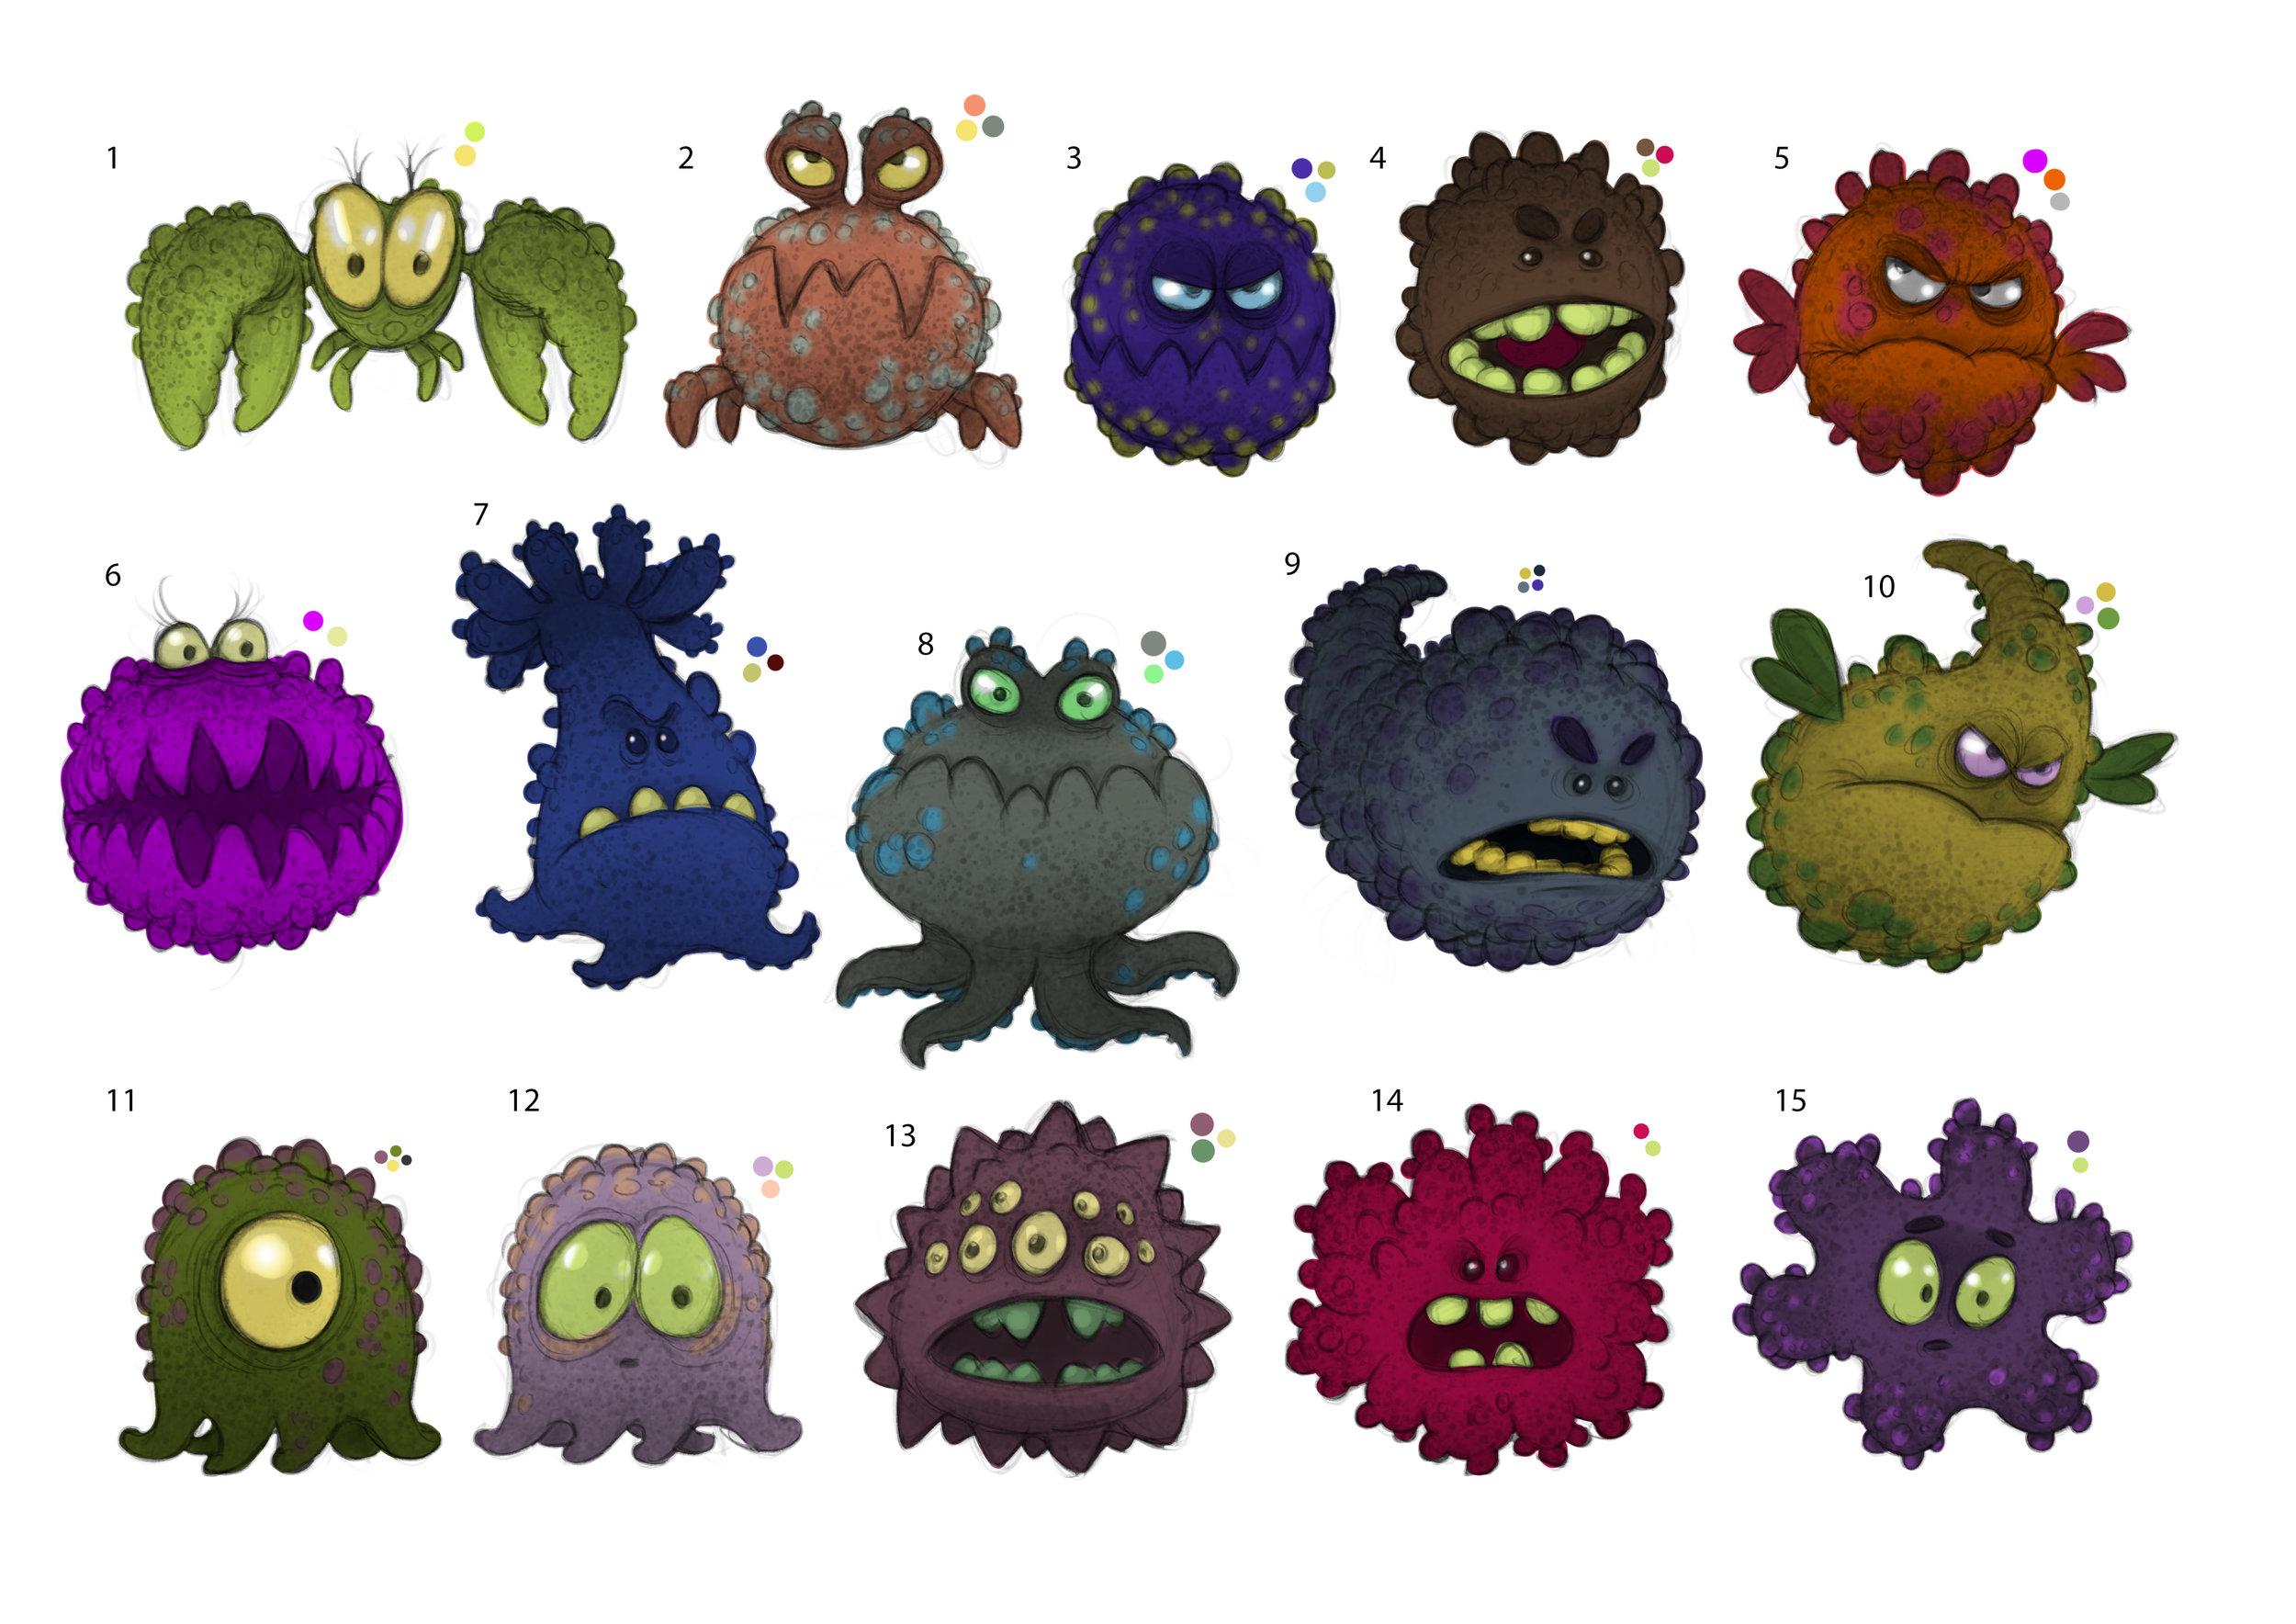 safeguard_germs_01_colorPass_v01_jr.jpg